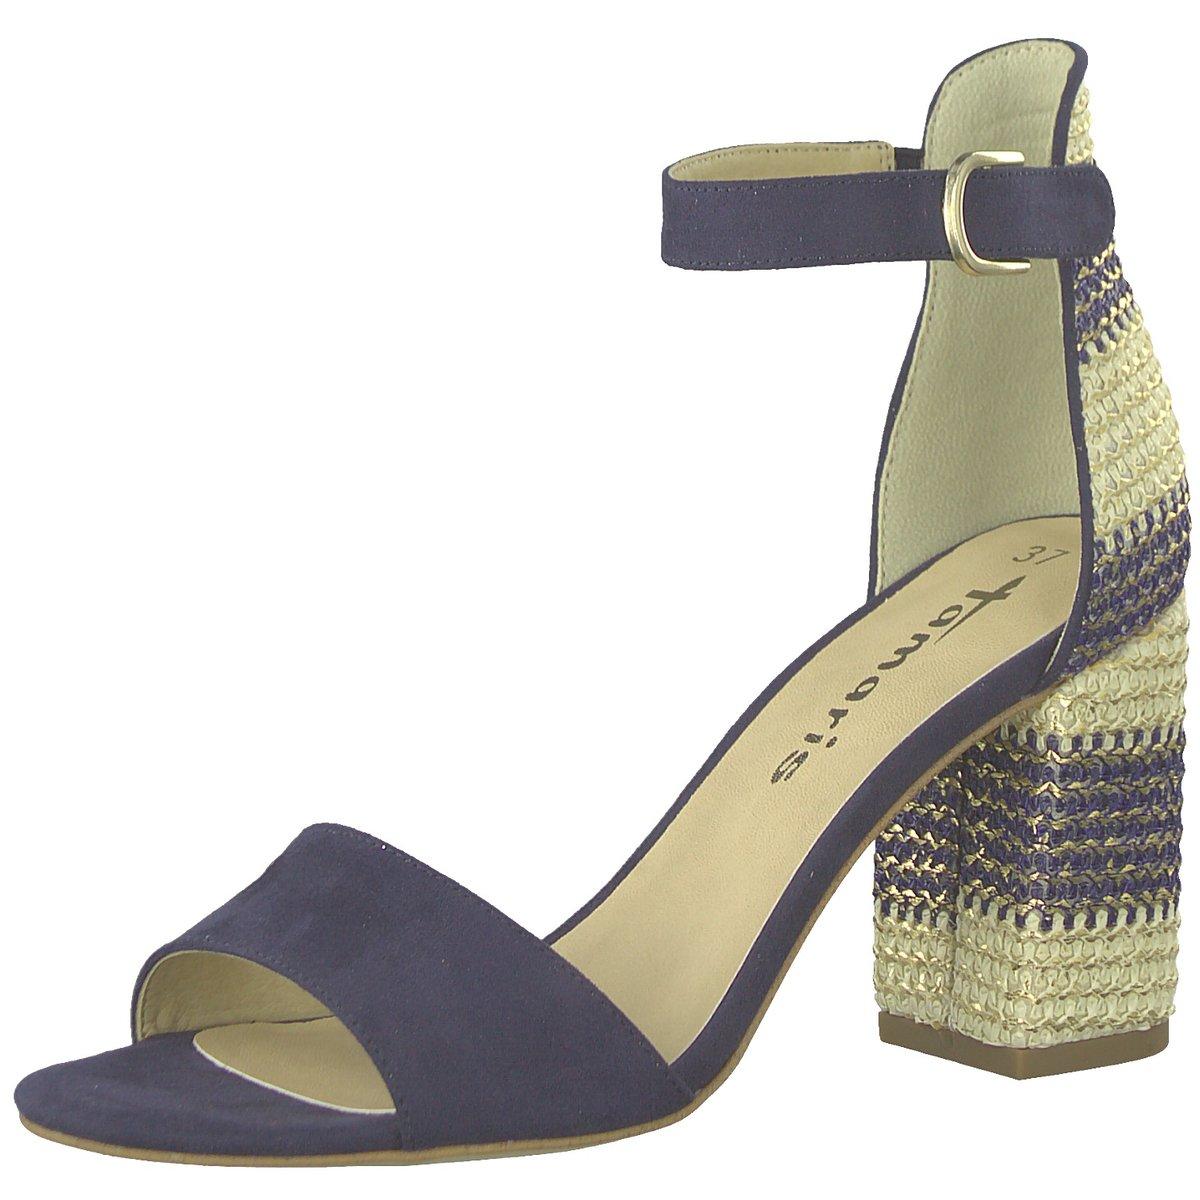 Sandalette 1 1 28356 22: Tamaris Sandaletten online kaufen!